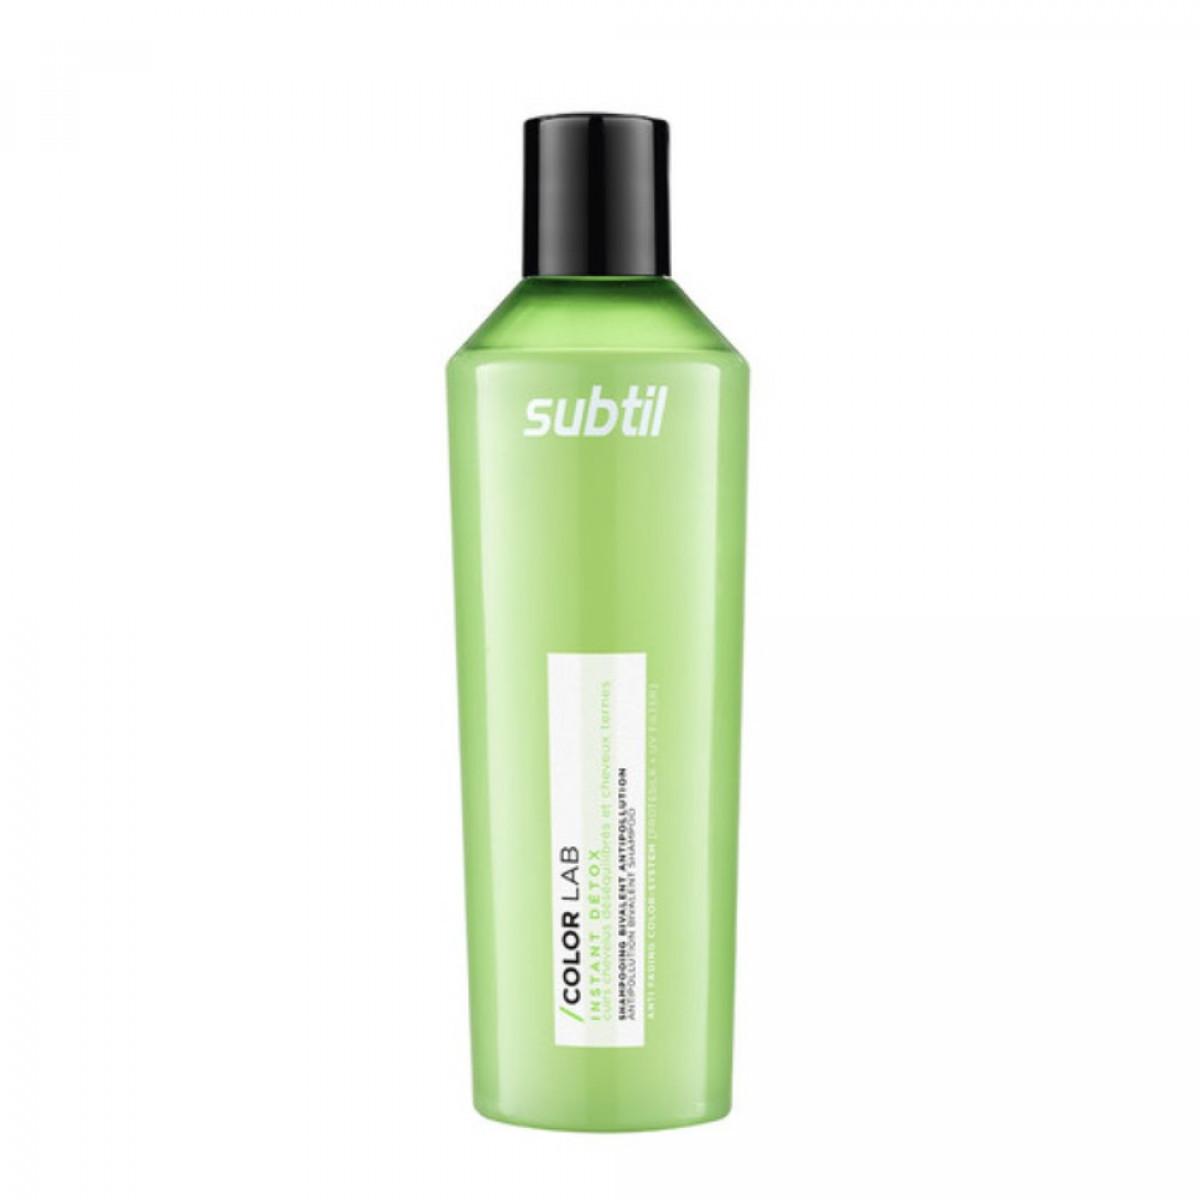 Subtil Color Lab Instant Detox Shampoing Bivalent Antipollution - Шампунь для волос с жирными корнями, 300 мл